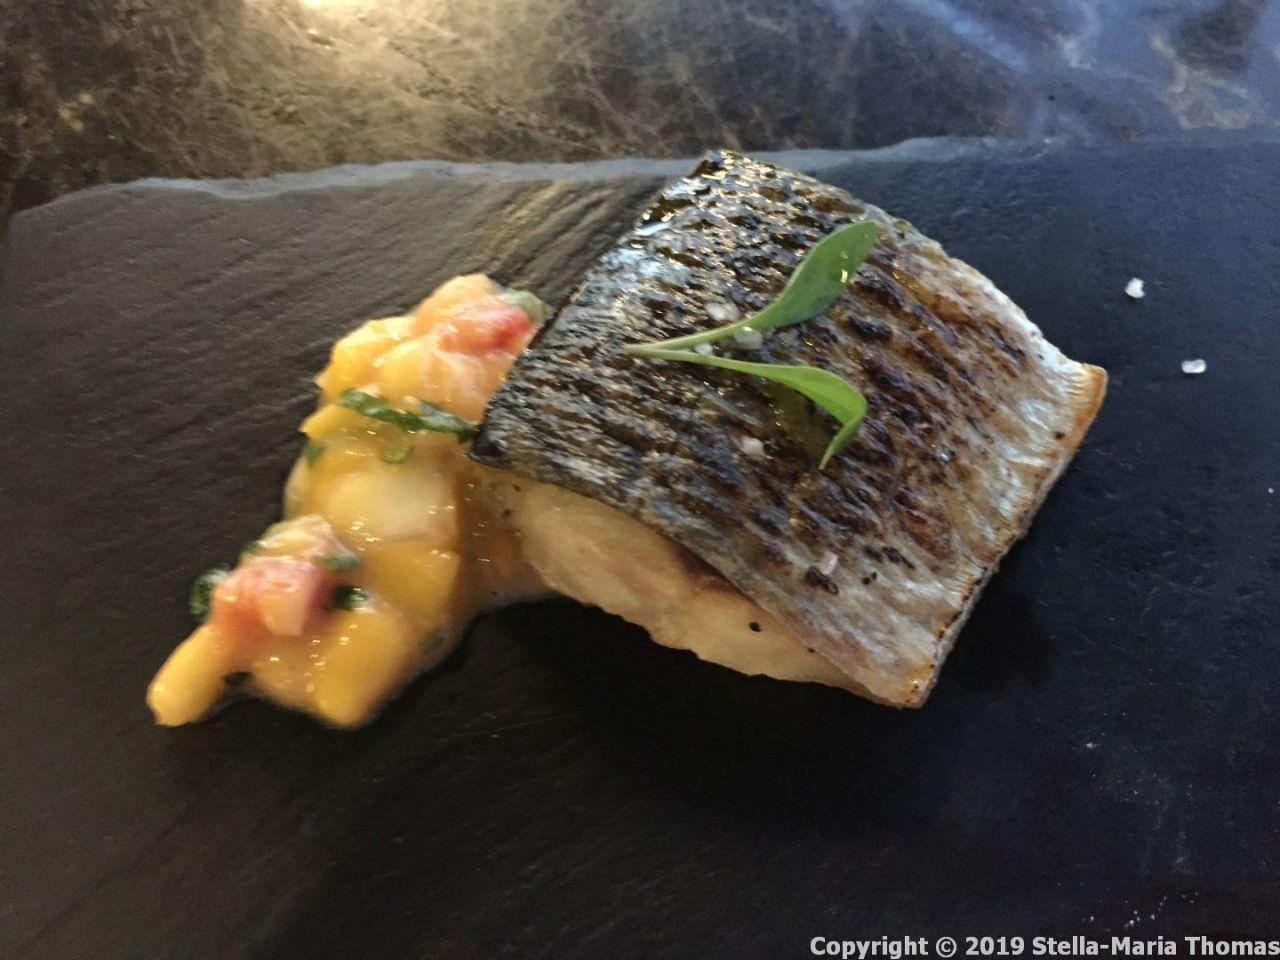 Food 2019 – UVA by Cálem, The Blini, Vila Nova deGaia